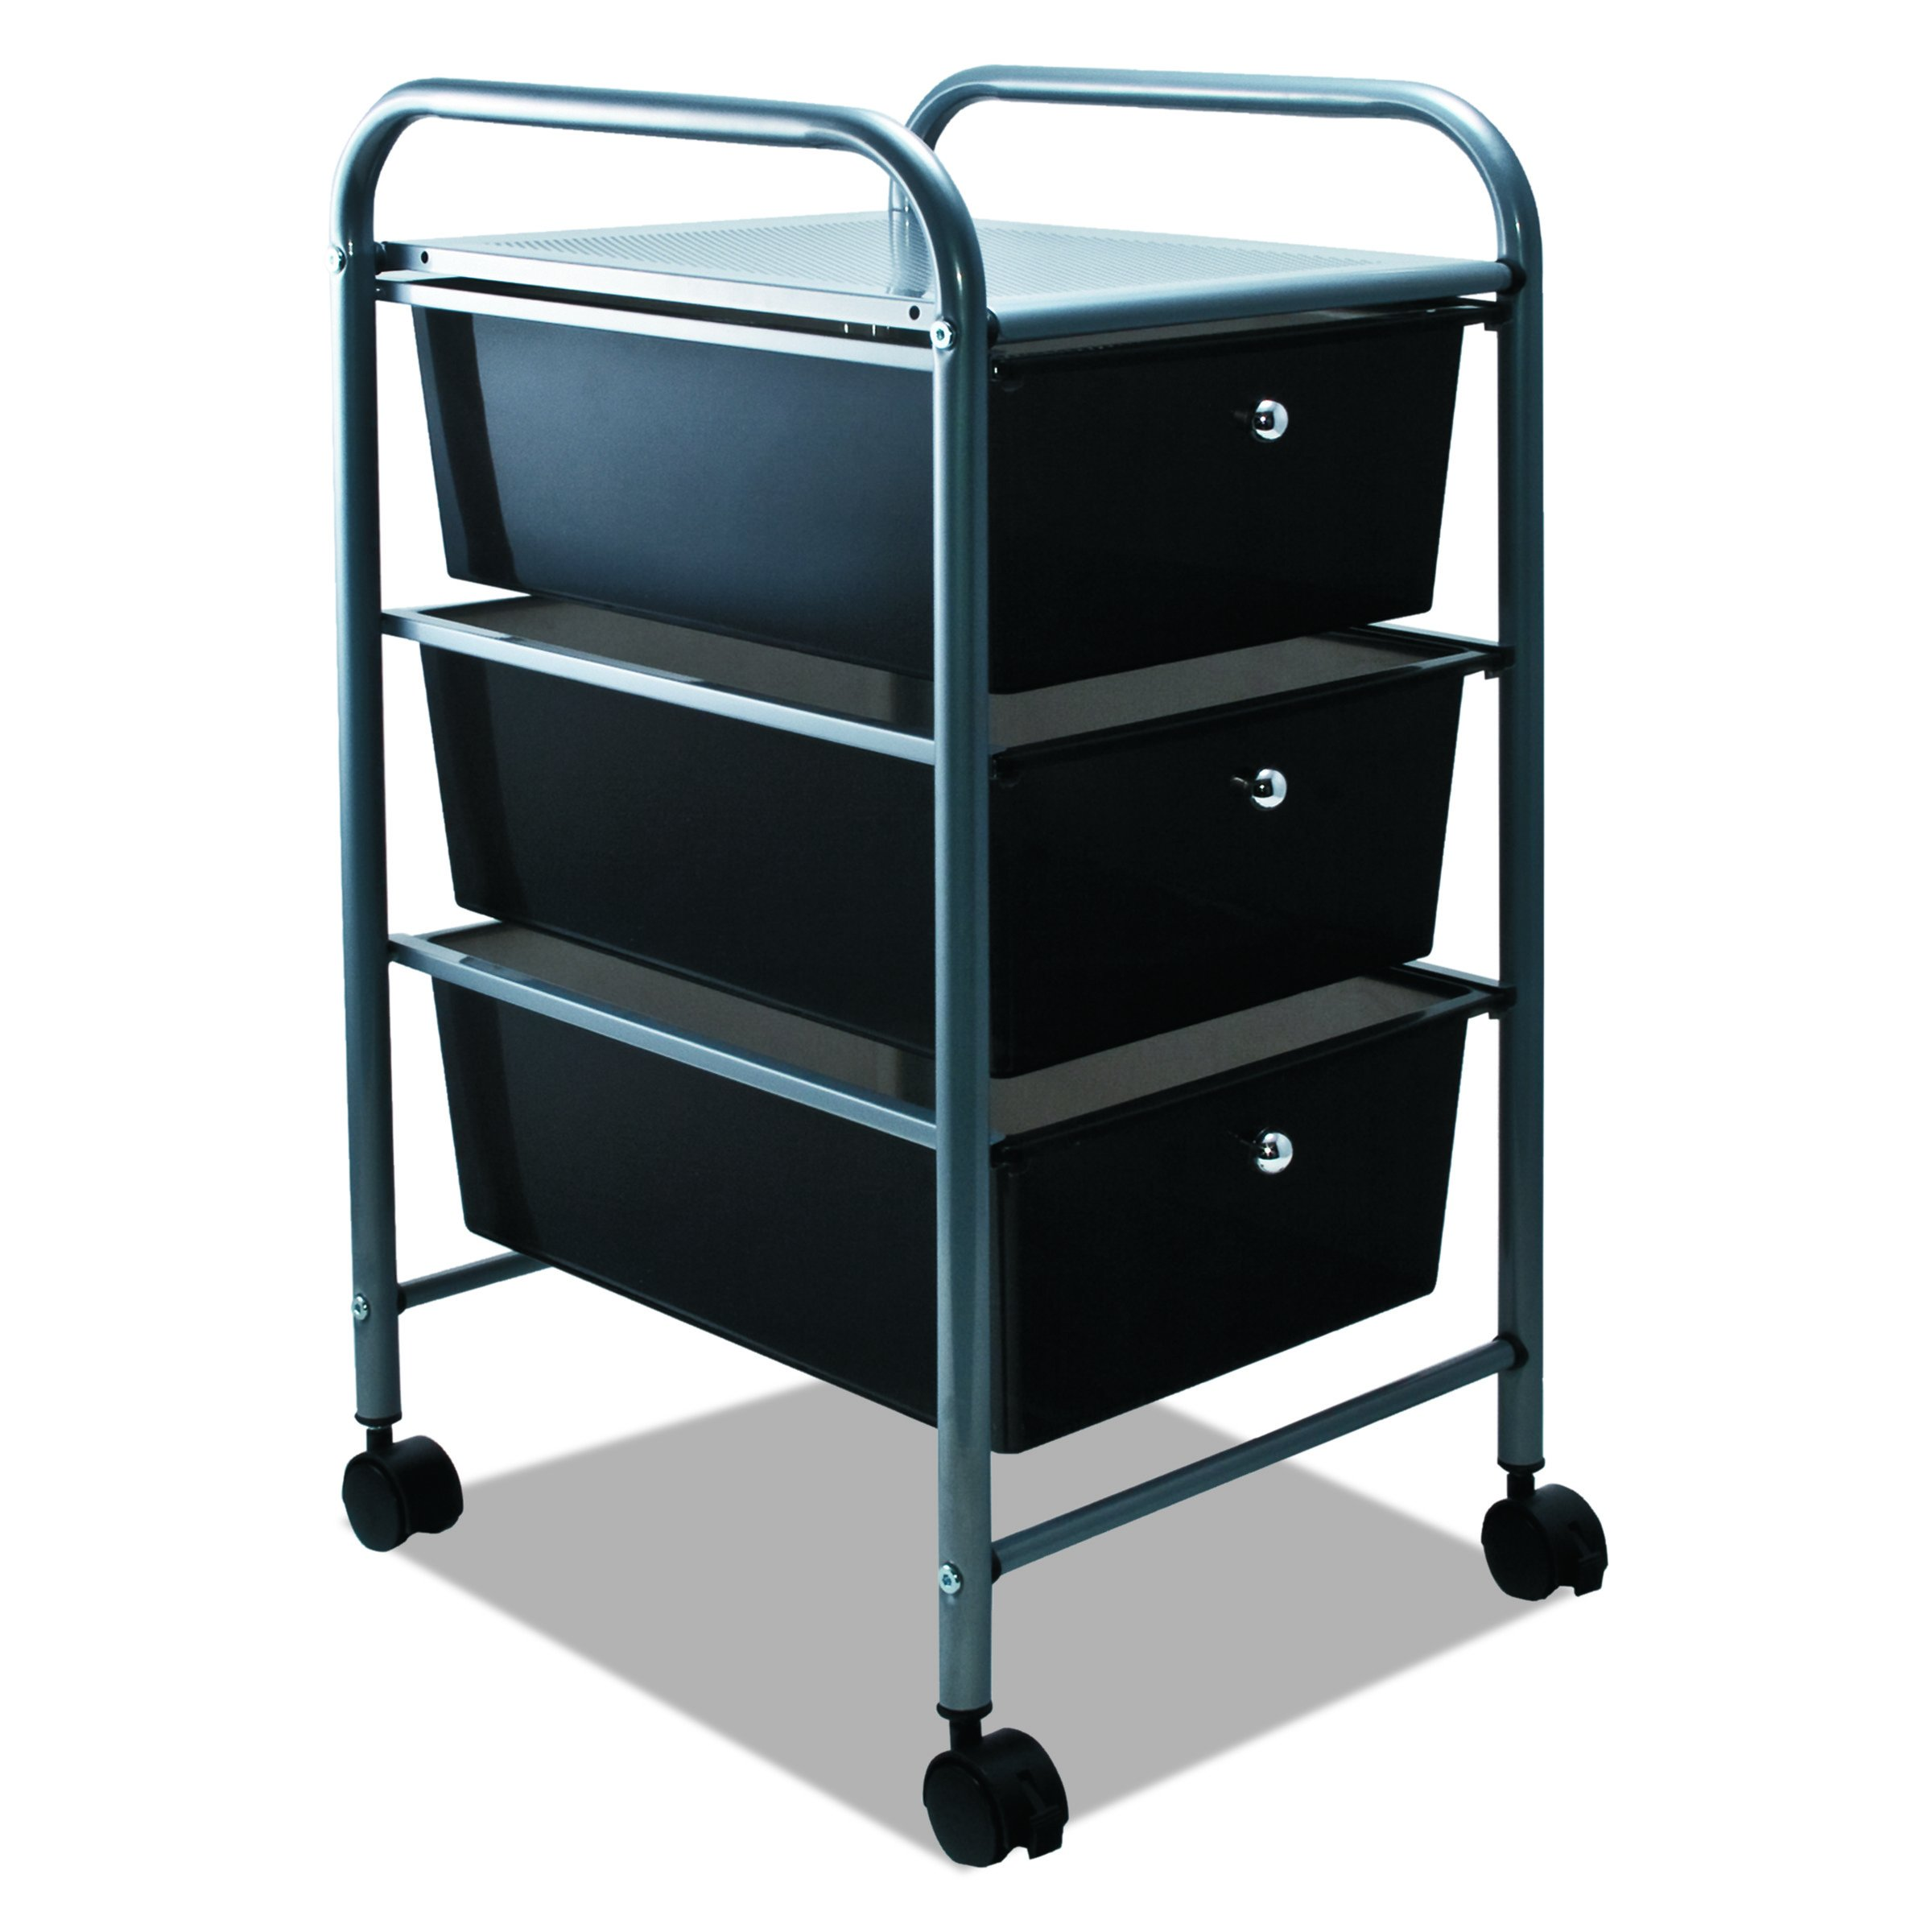 ADVANTUS 3-Drawer Rolling File Organizer Cart, 27 x 15.5 x 13 Inches, Black (34006)